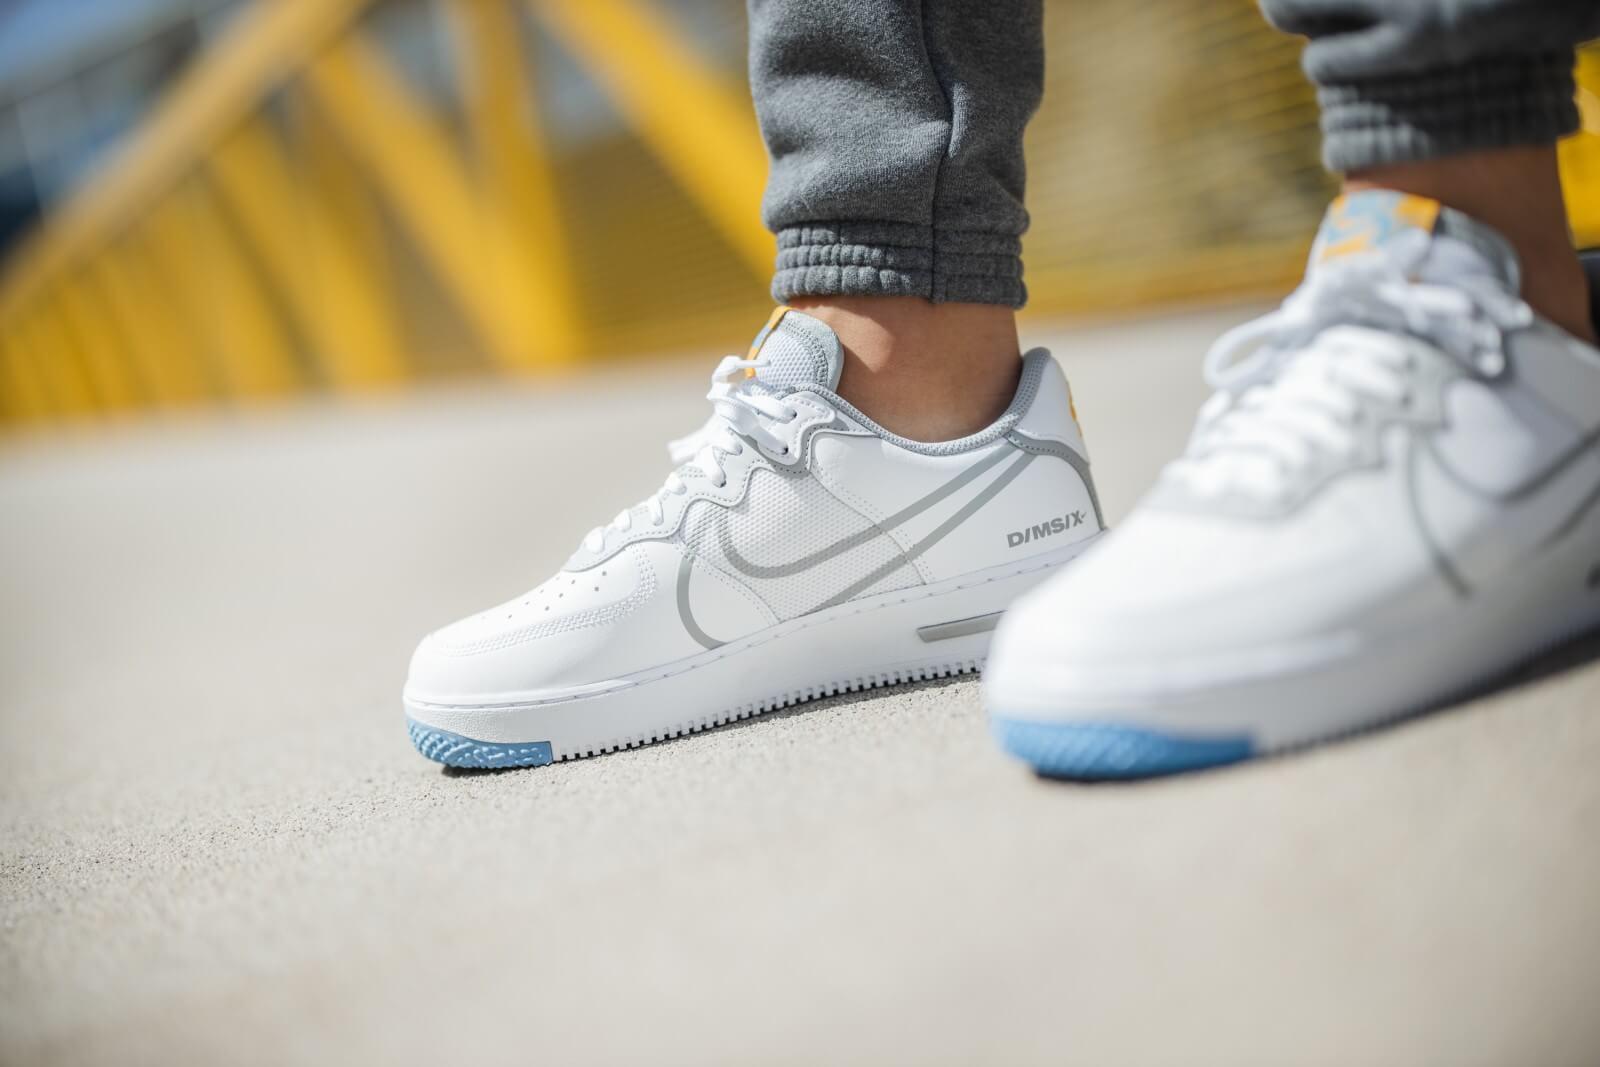 Nike Air Force 1 React White/University